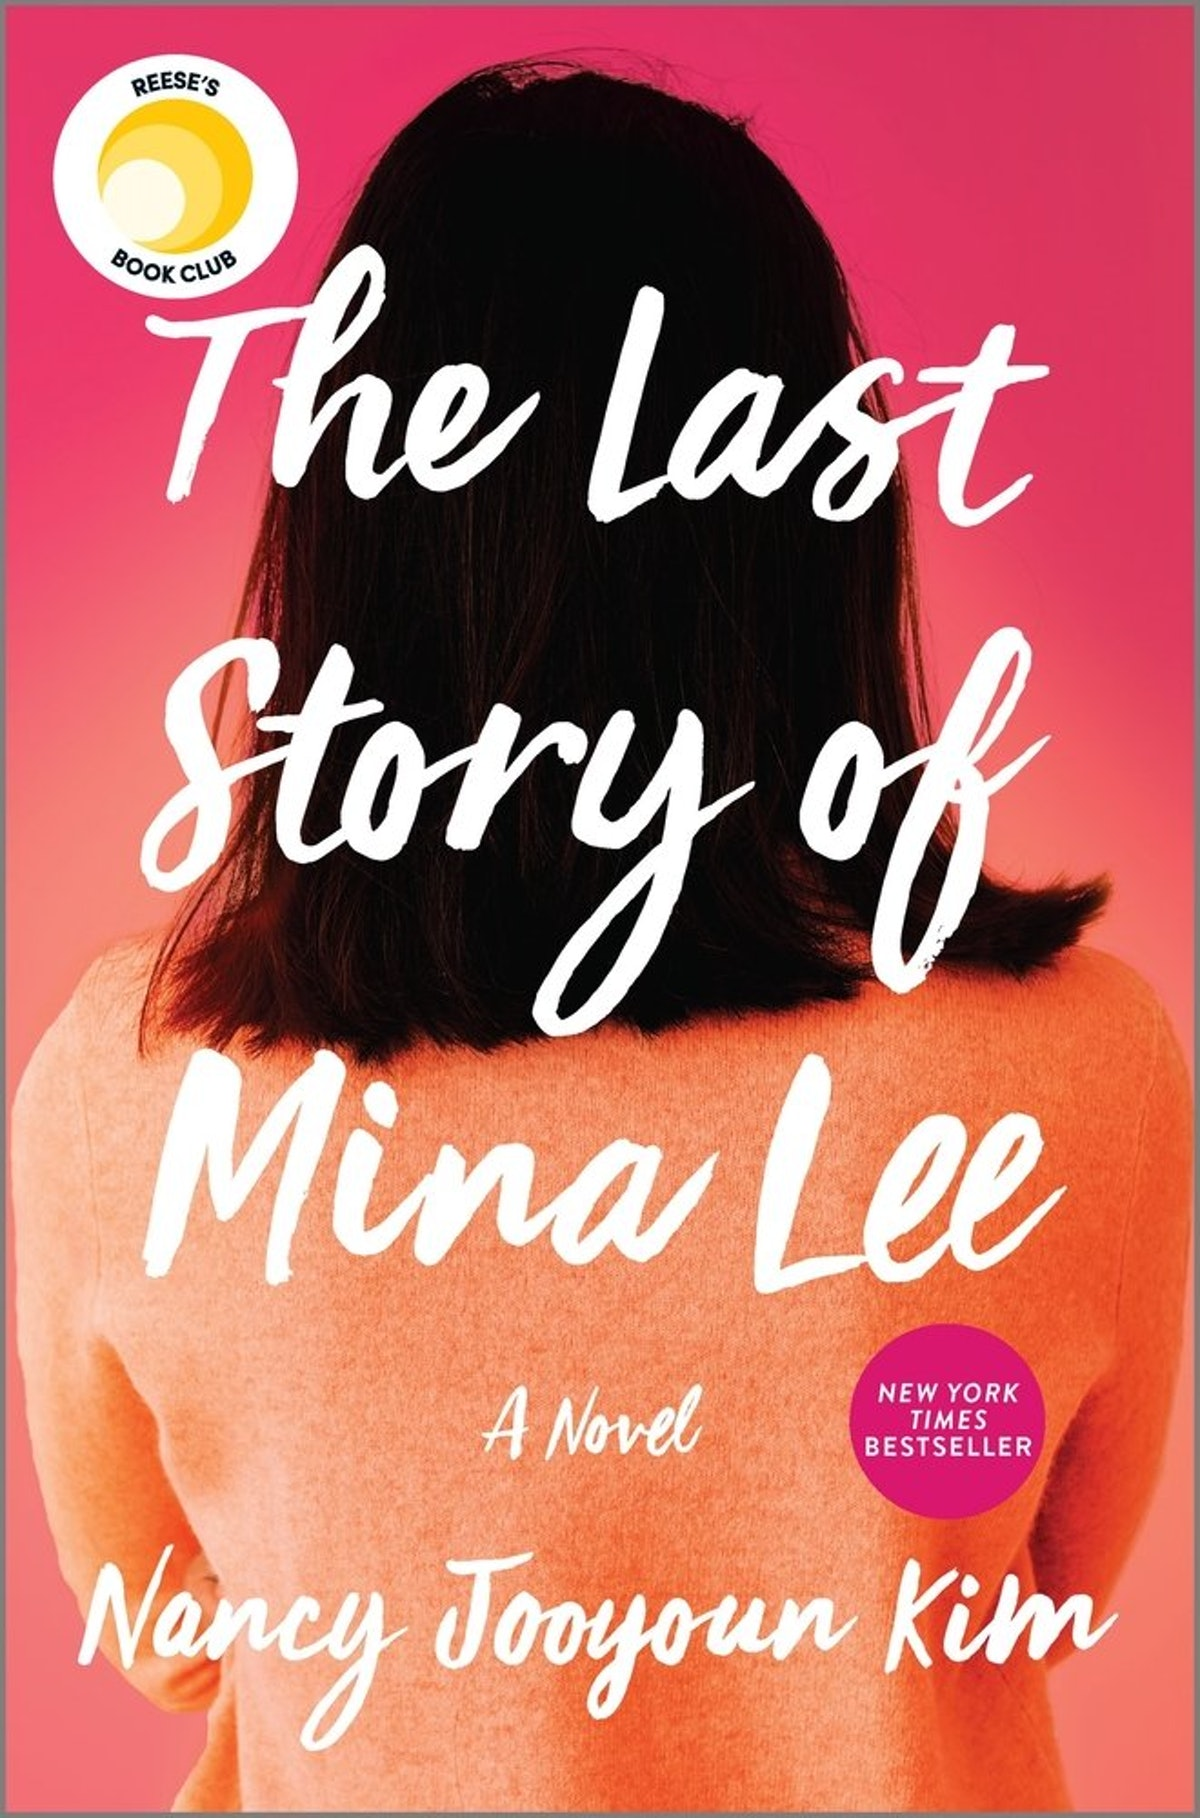 'The Last Story of Mina Lee: A Novel' by Nancy Jooyoun Kim